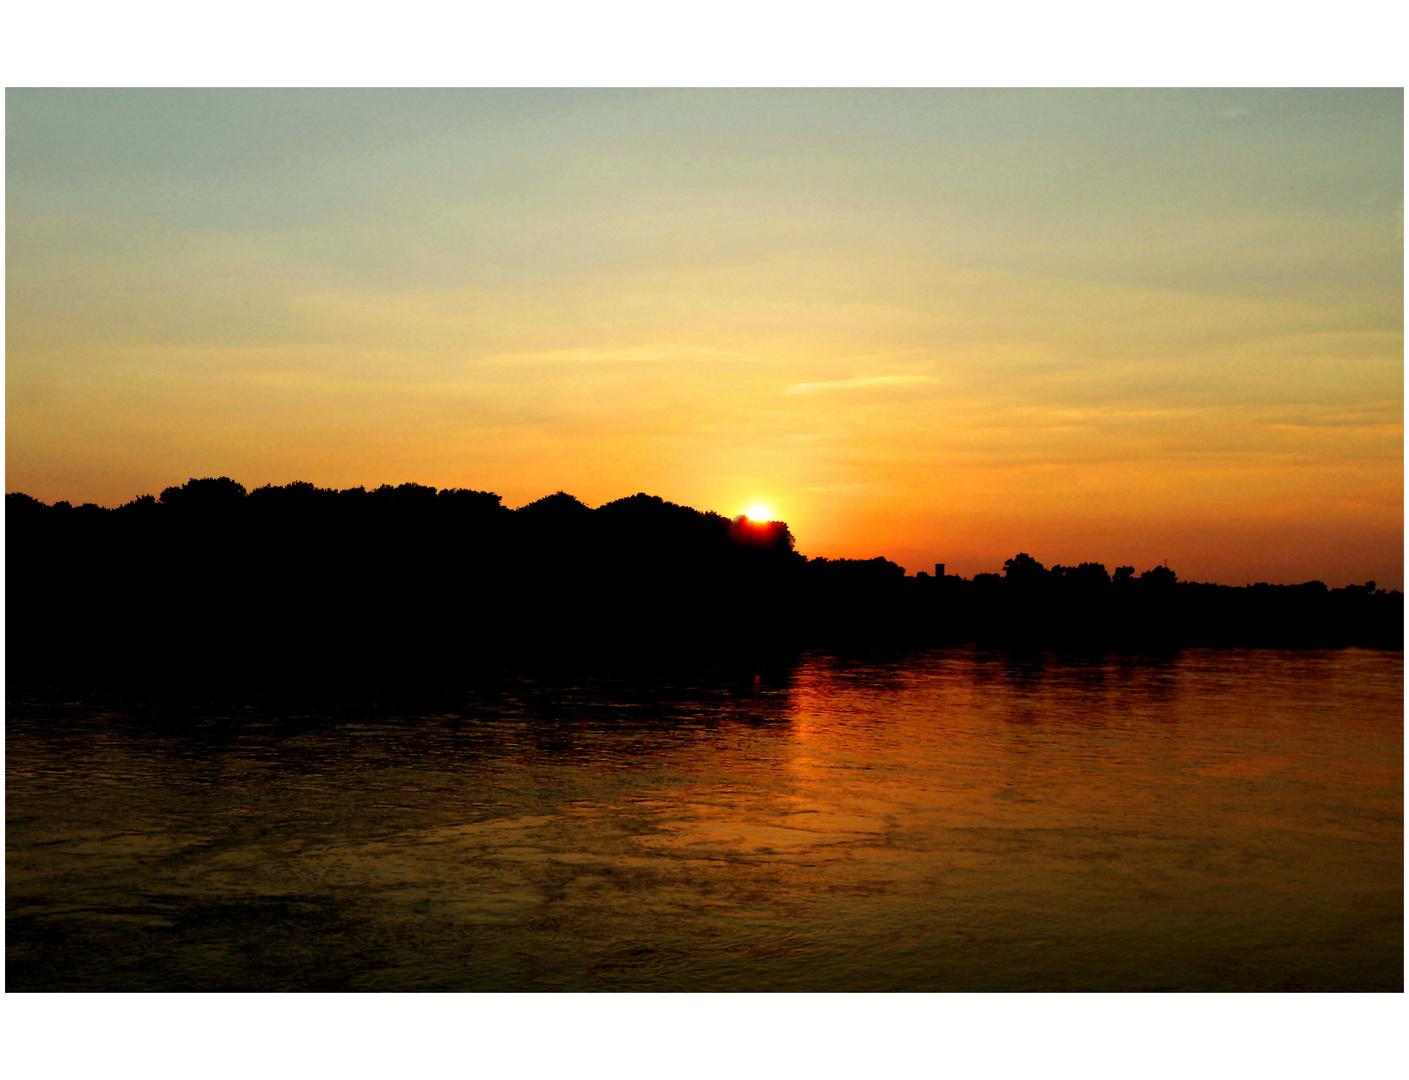 Sonnenuntergang in Königswinter